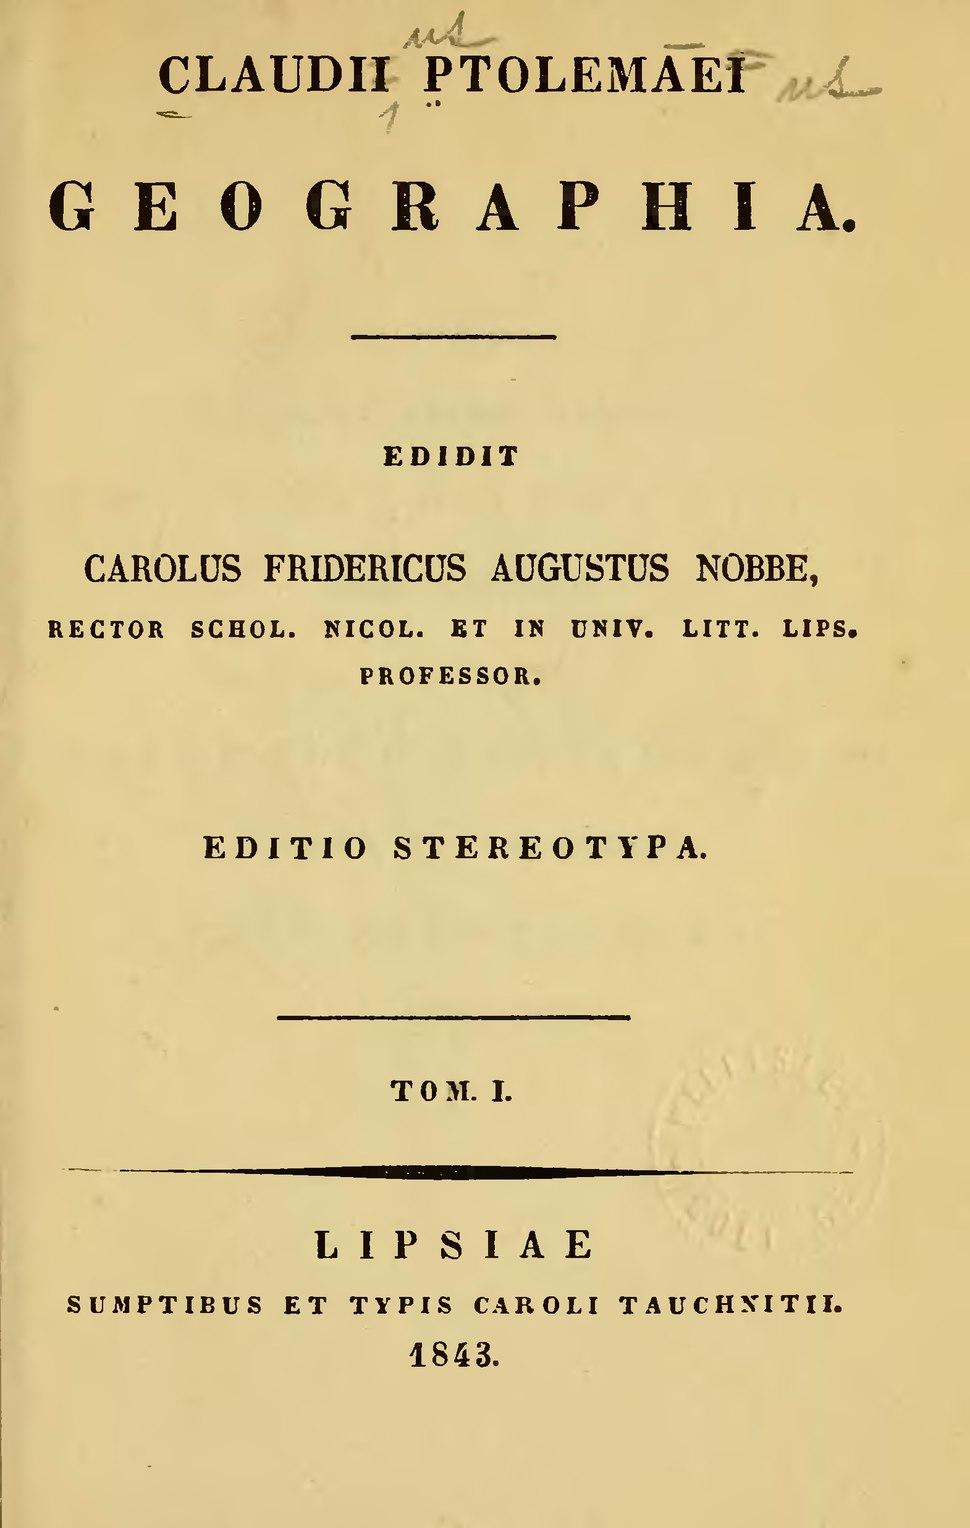 Claudii Ptolemaei geographia, 1843, vol1.djvu&page=7